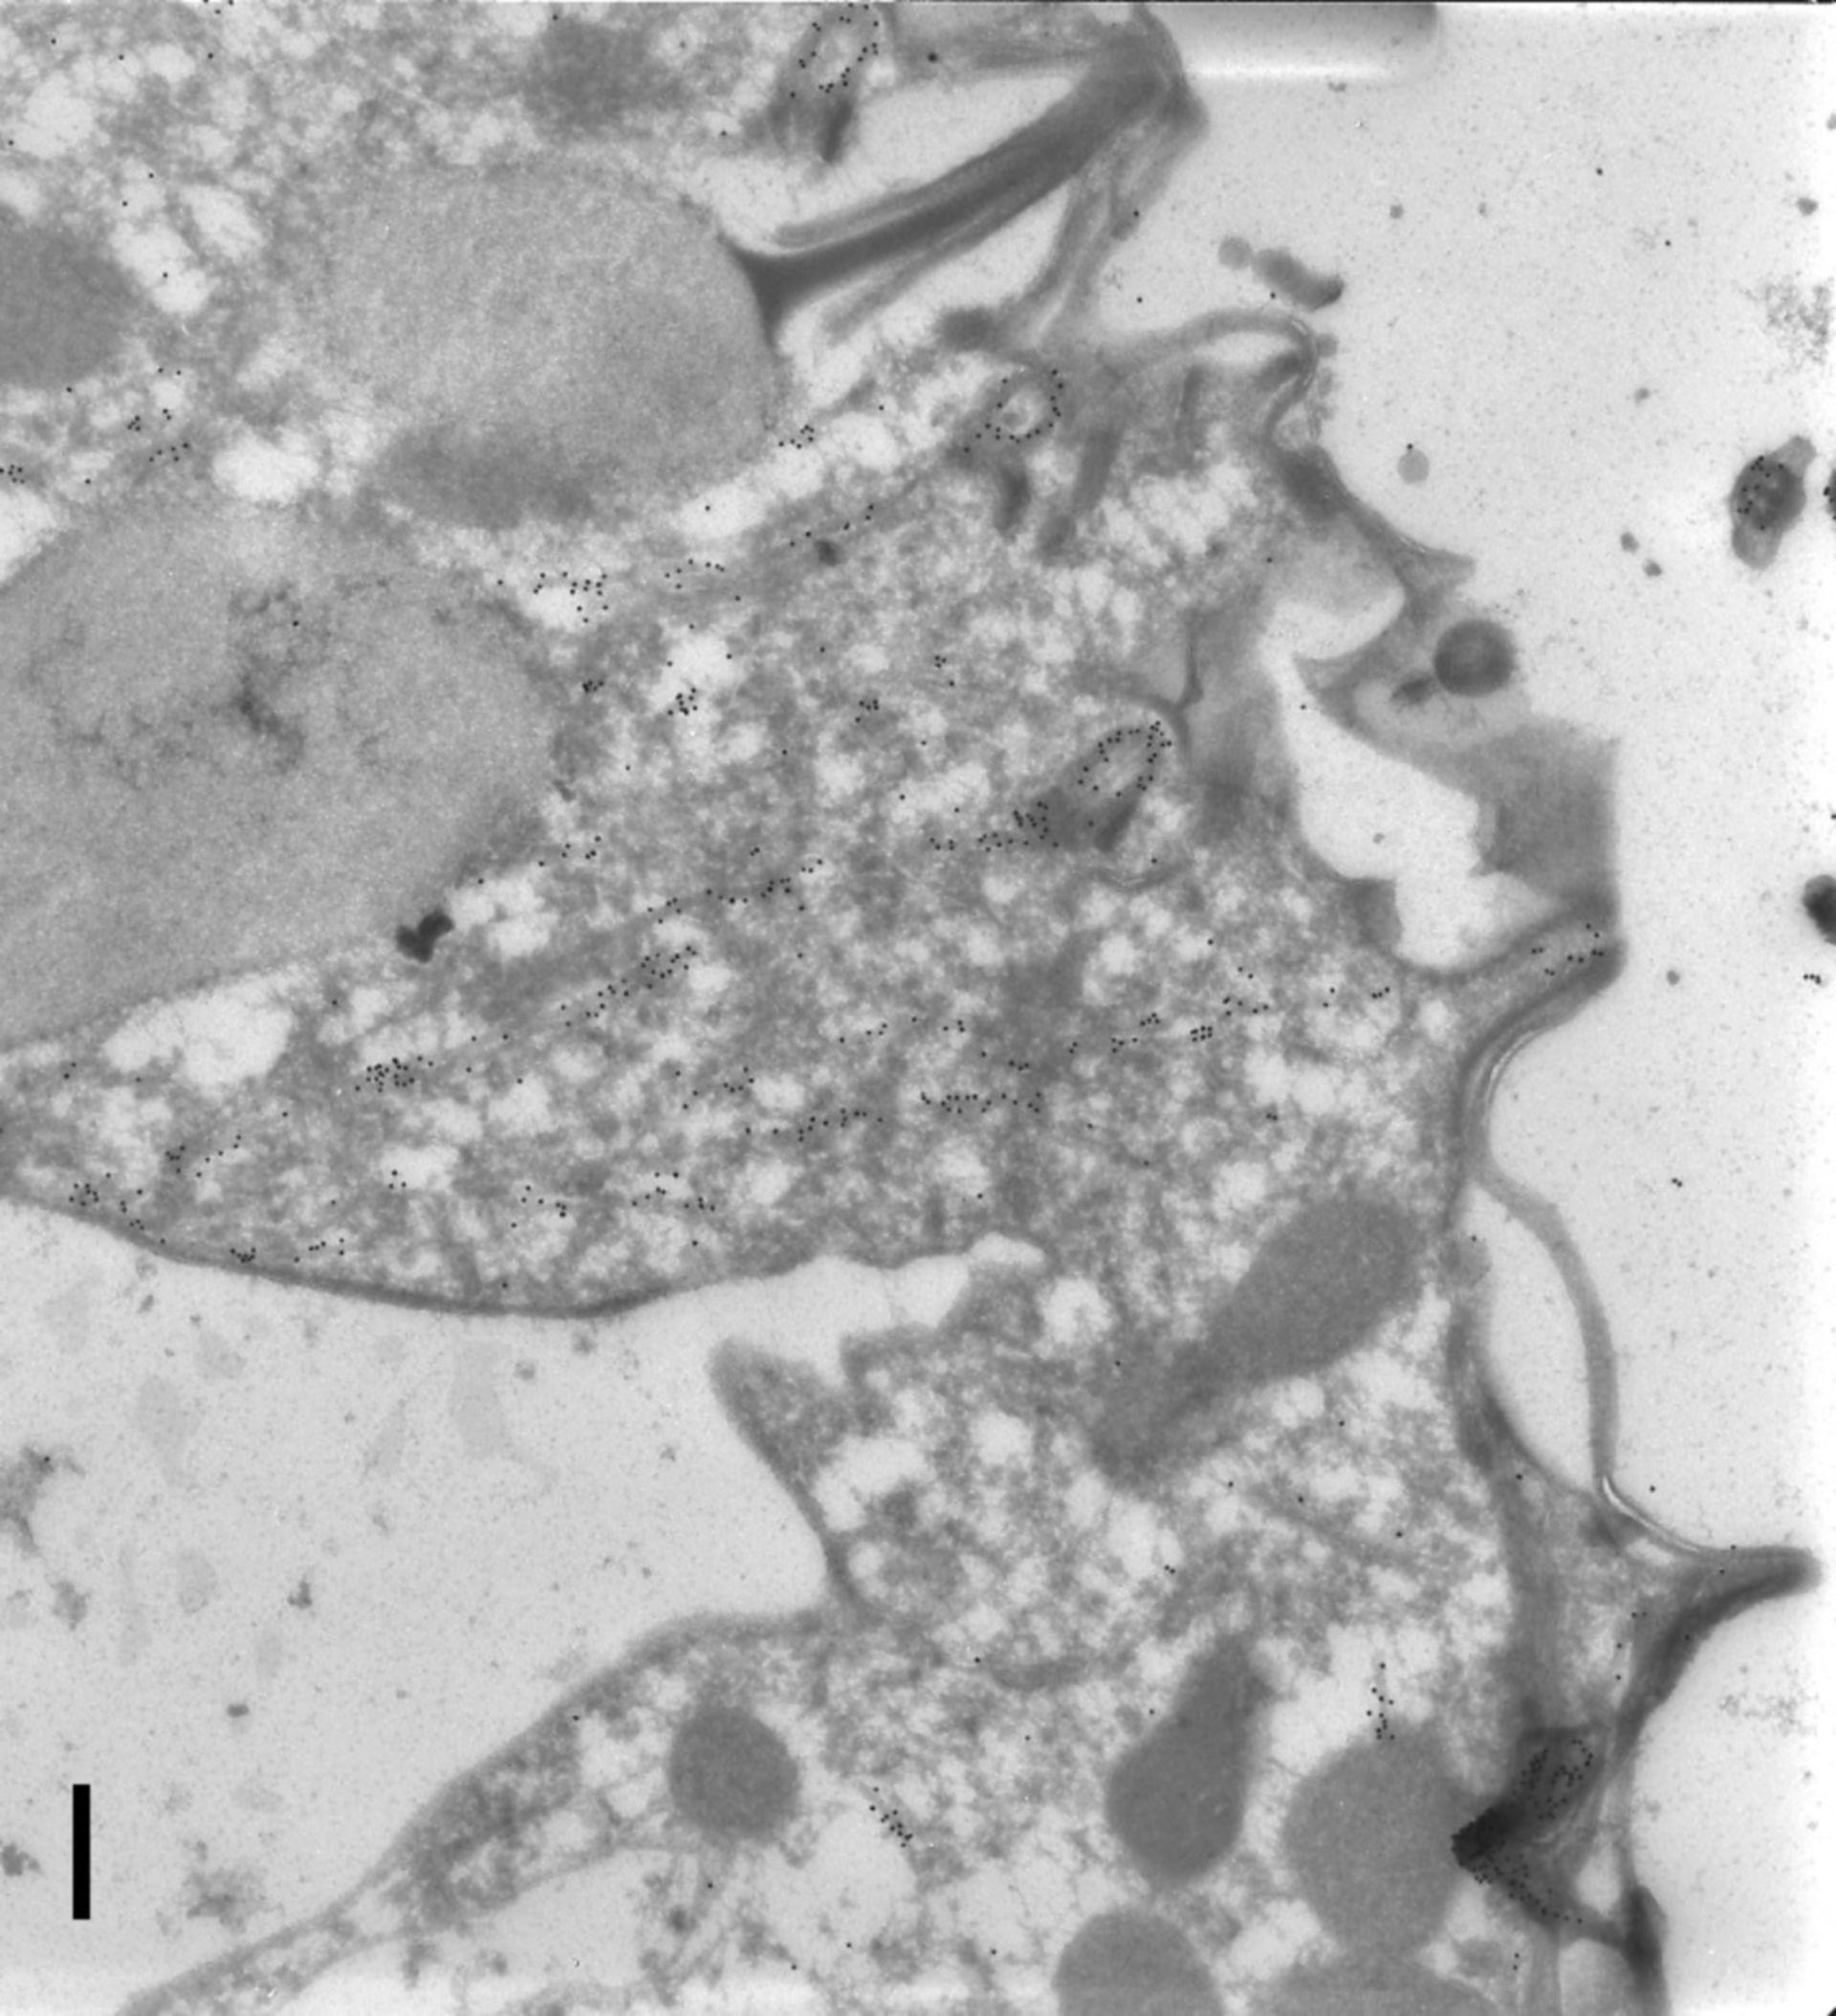 Paramecium tetraurelia (Cytoproct) - CIL:9850